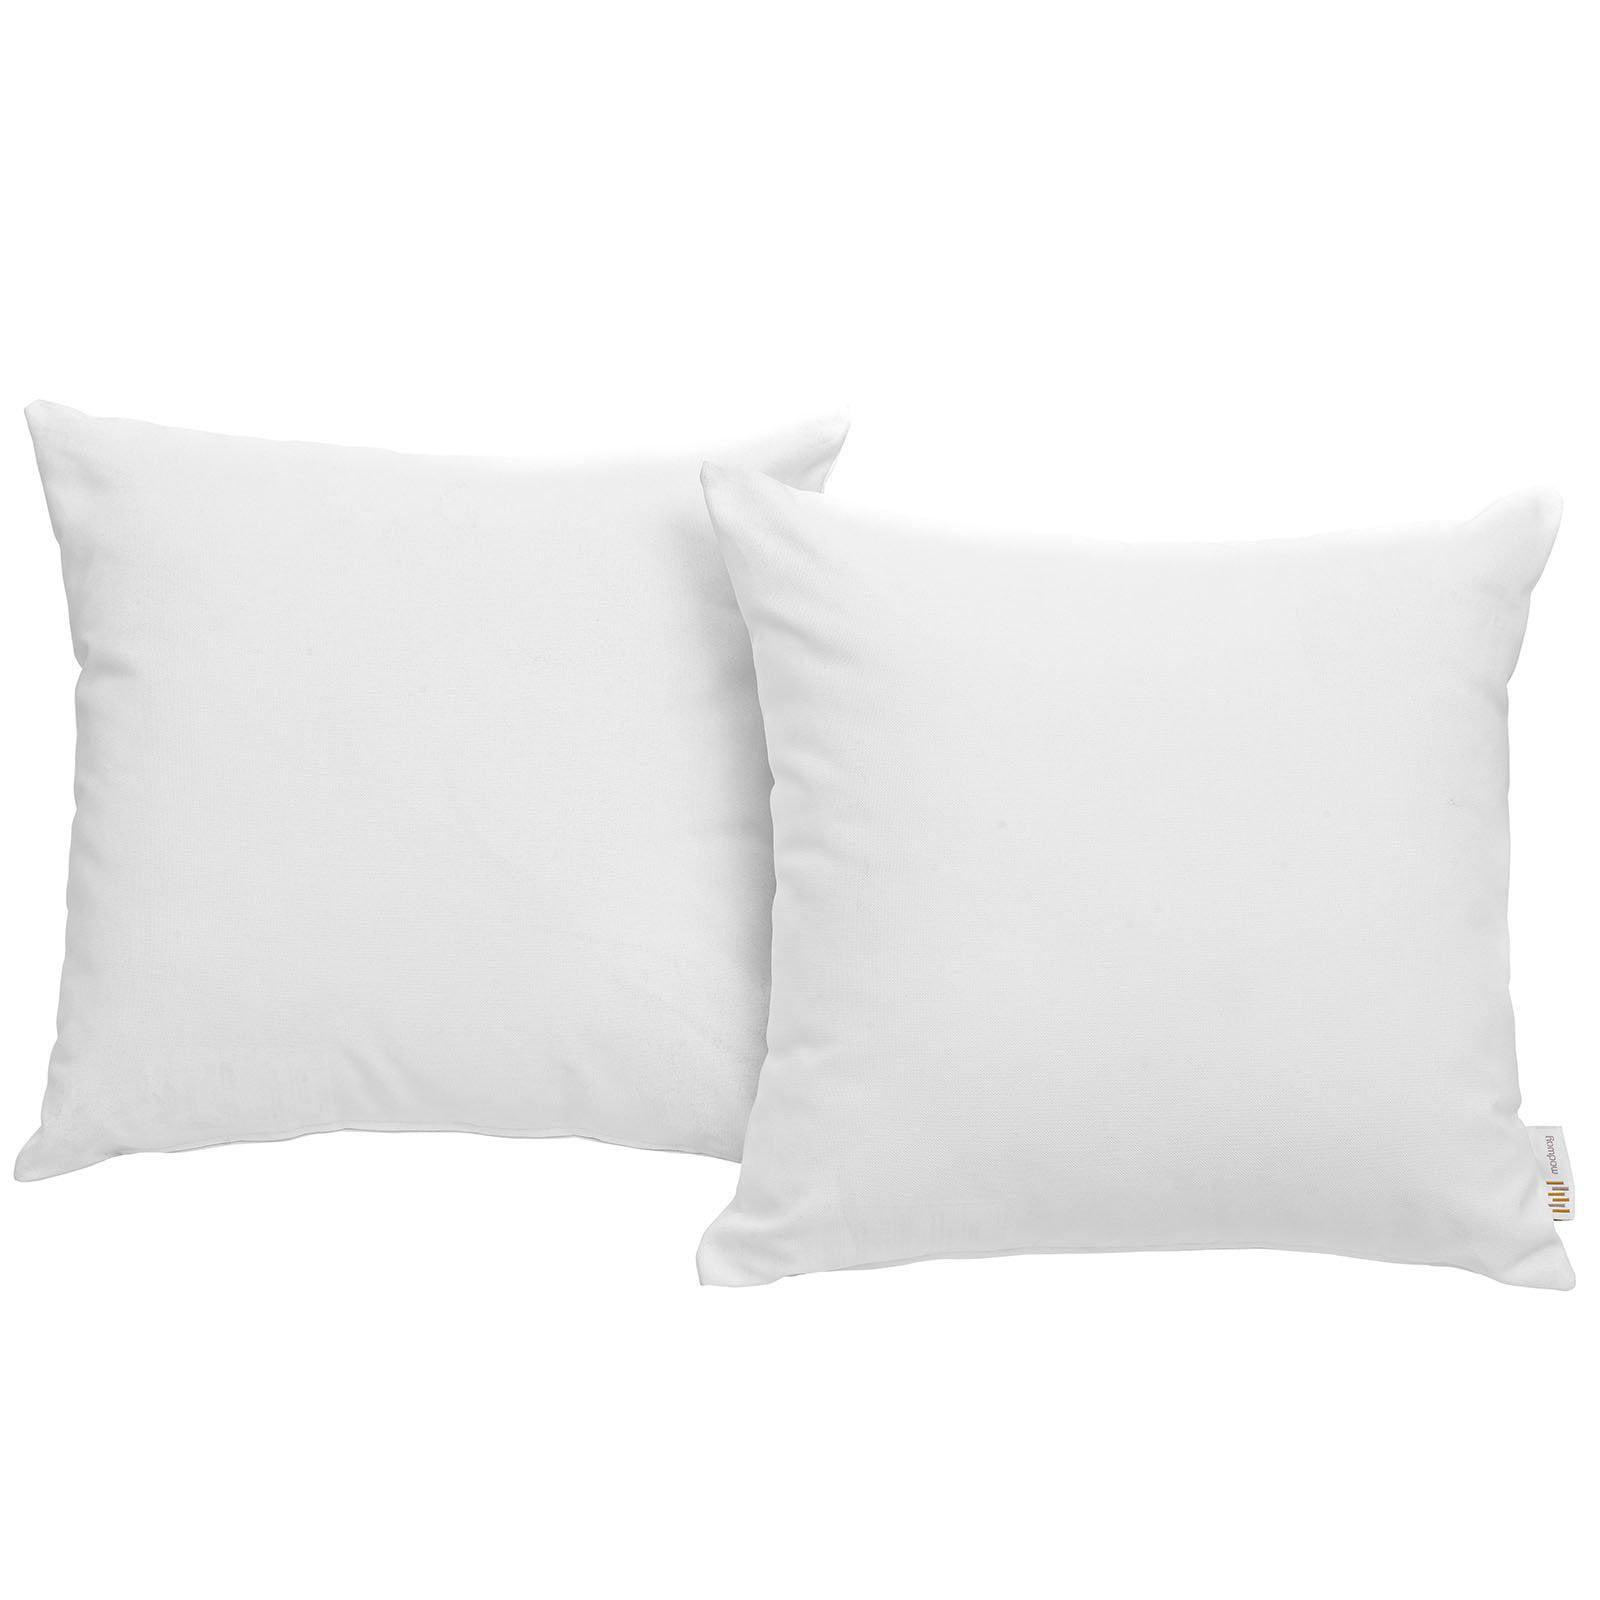 Modway Convene 2 Piece Outdoor Patio Pillow Set, Multiple Colors    Walmart.com